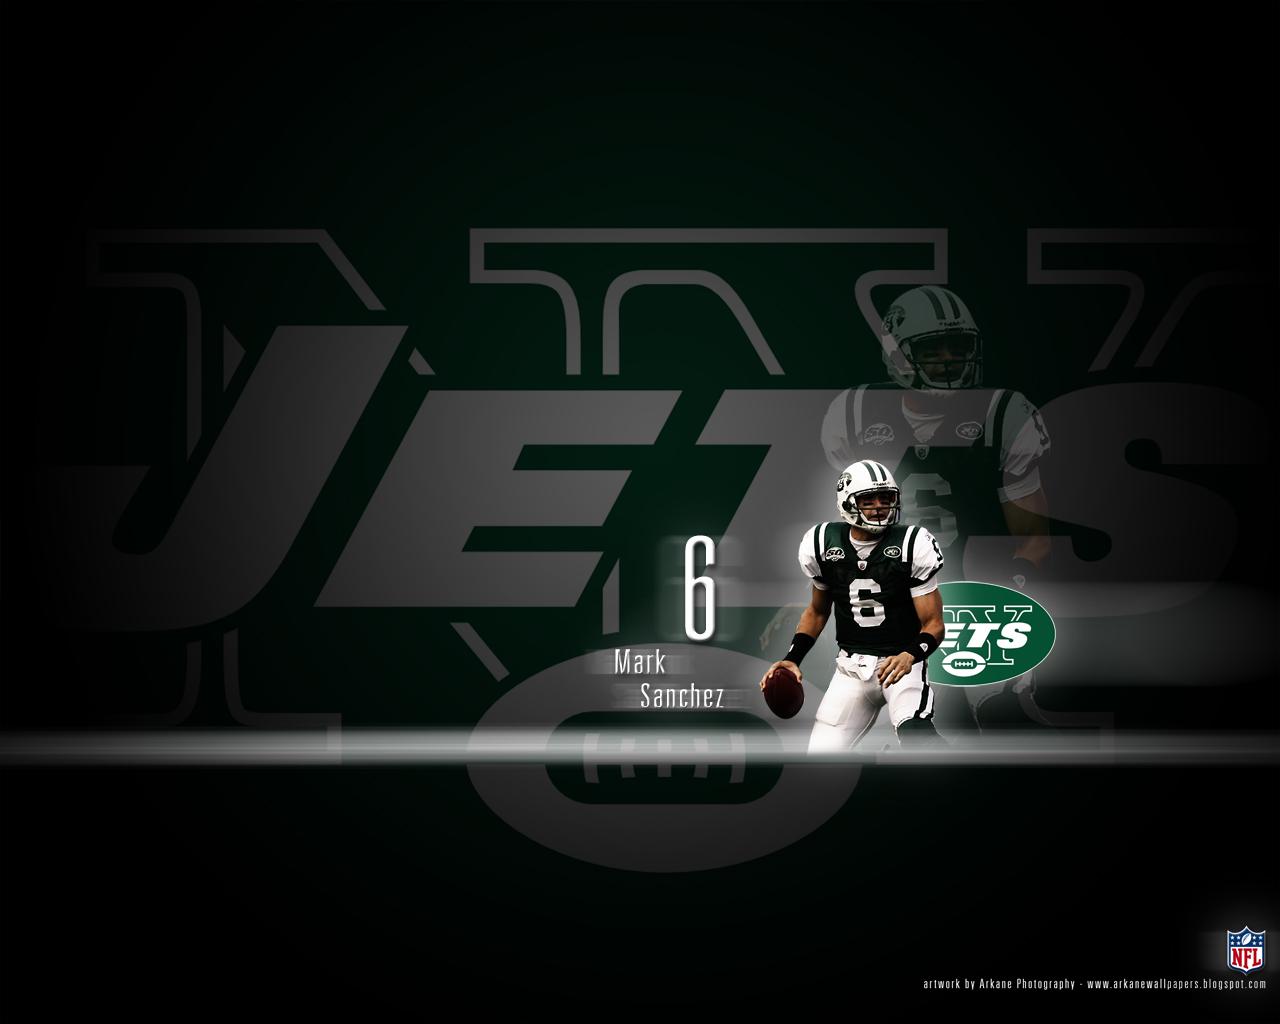 http://1.bp.blogspot.com/_JuYYGgmnUQU/SwP5Ivi1B-I/AAAAAAAAAXQ/dEgVXN_rFgk/s1600/6+Mark+Sanchez+-+Jets.jpeg